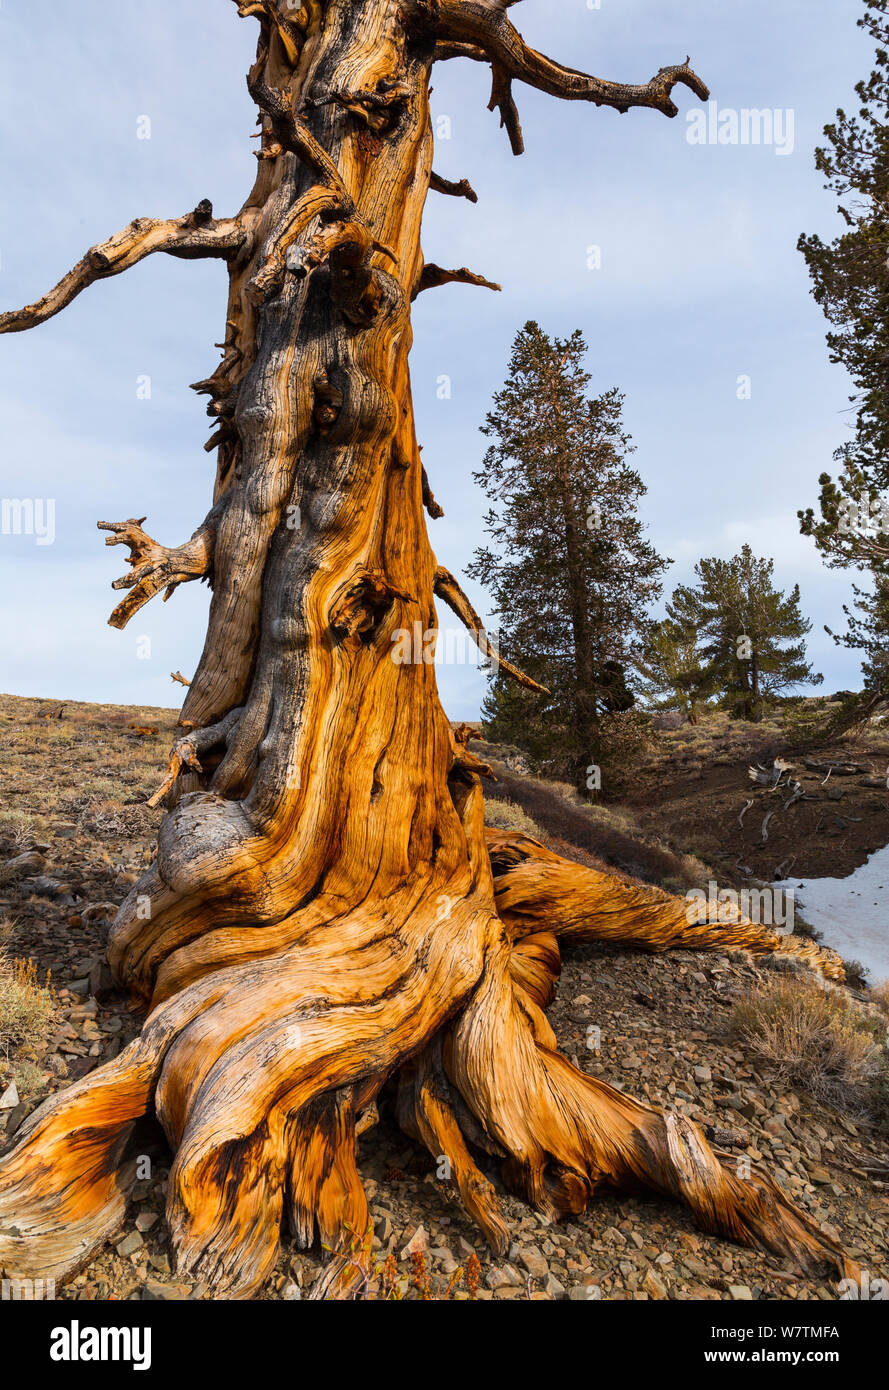 Great Basin Bristlecone Pine (Pinus longaeva) antiguo árbol, Bosque Nacional Inyo, White Mountains, California, USA. Foto de stock